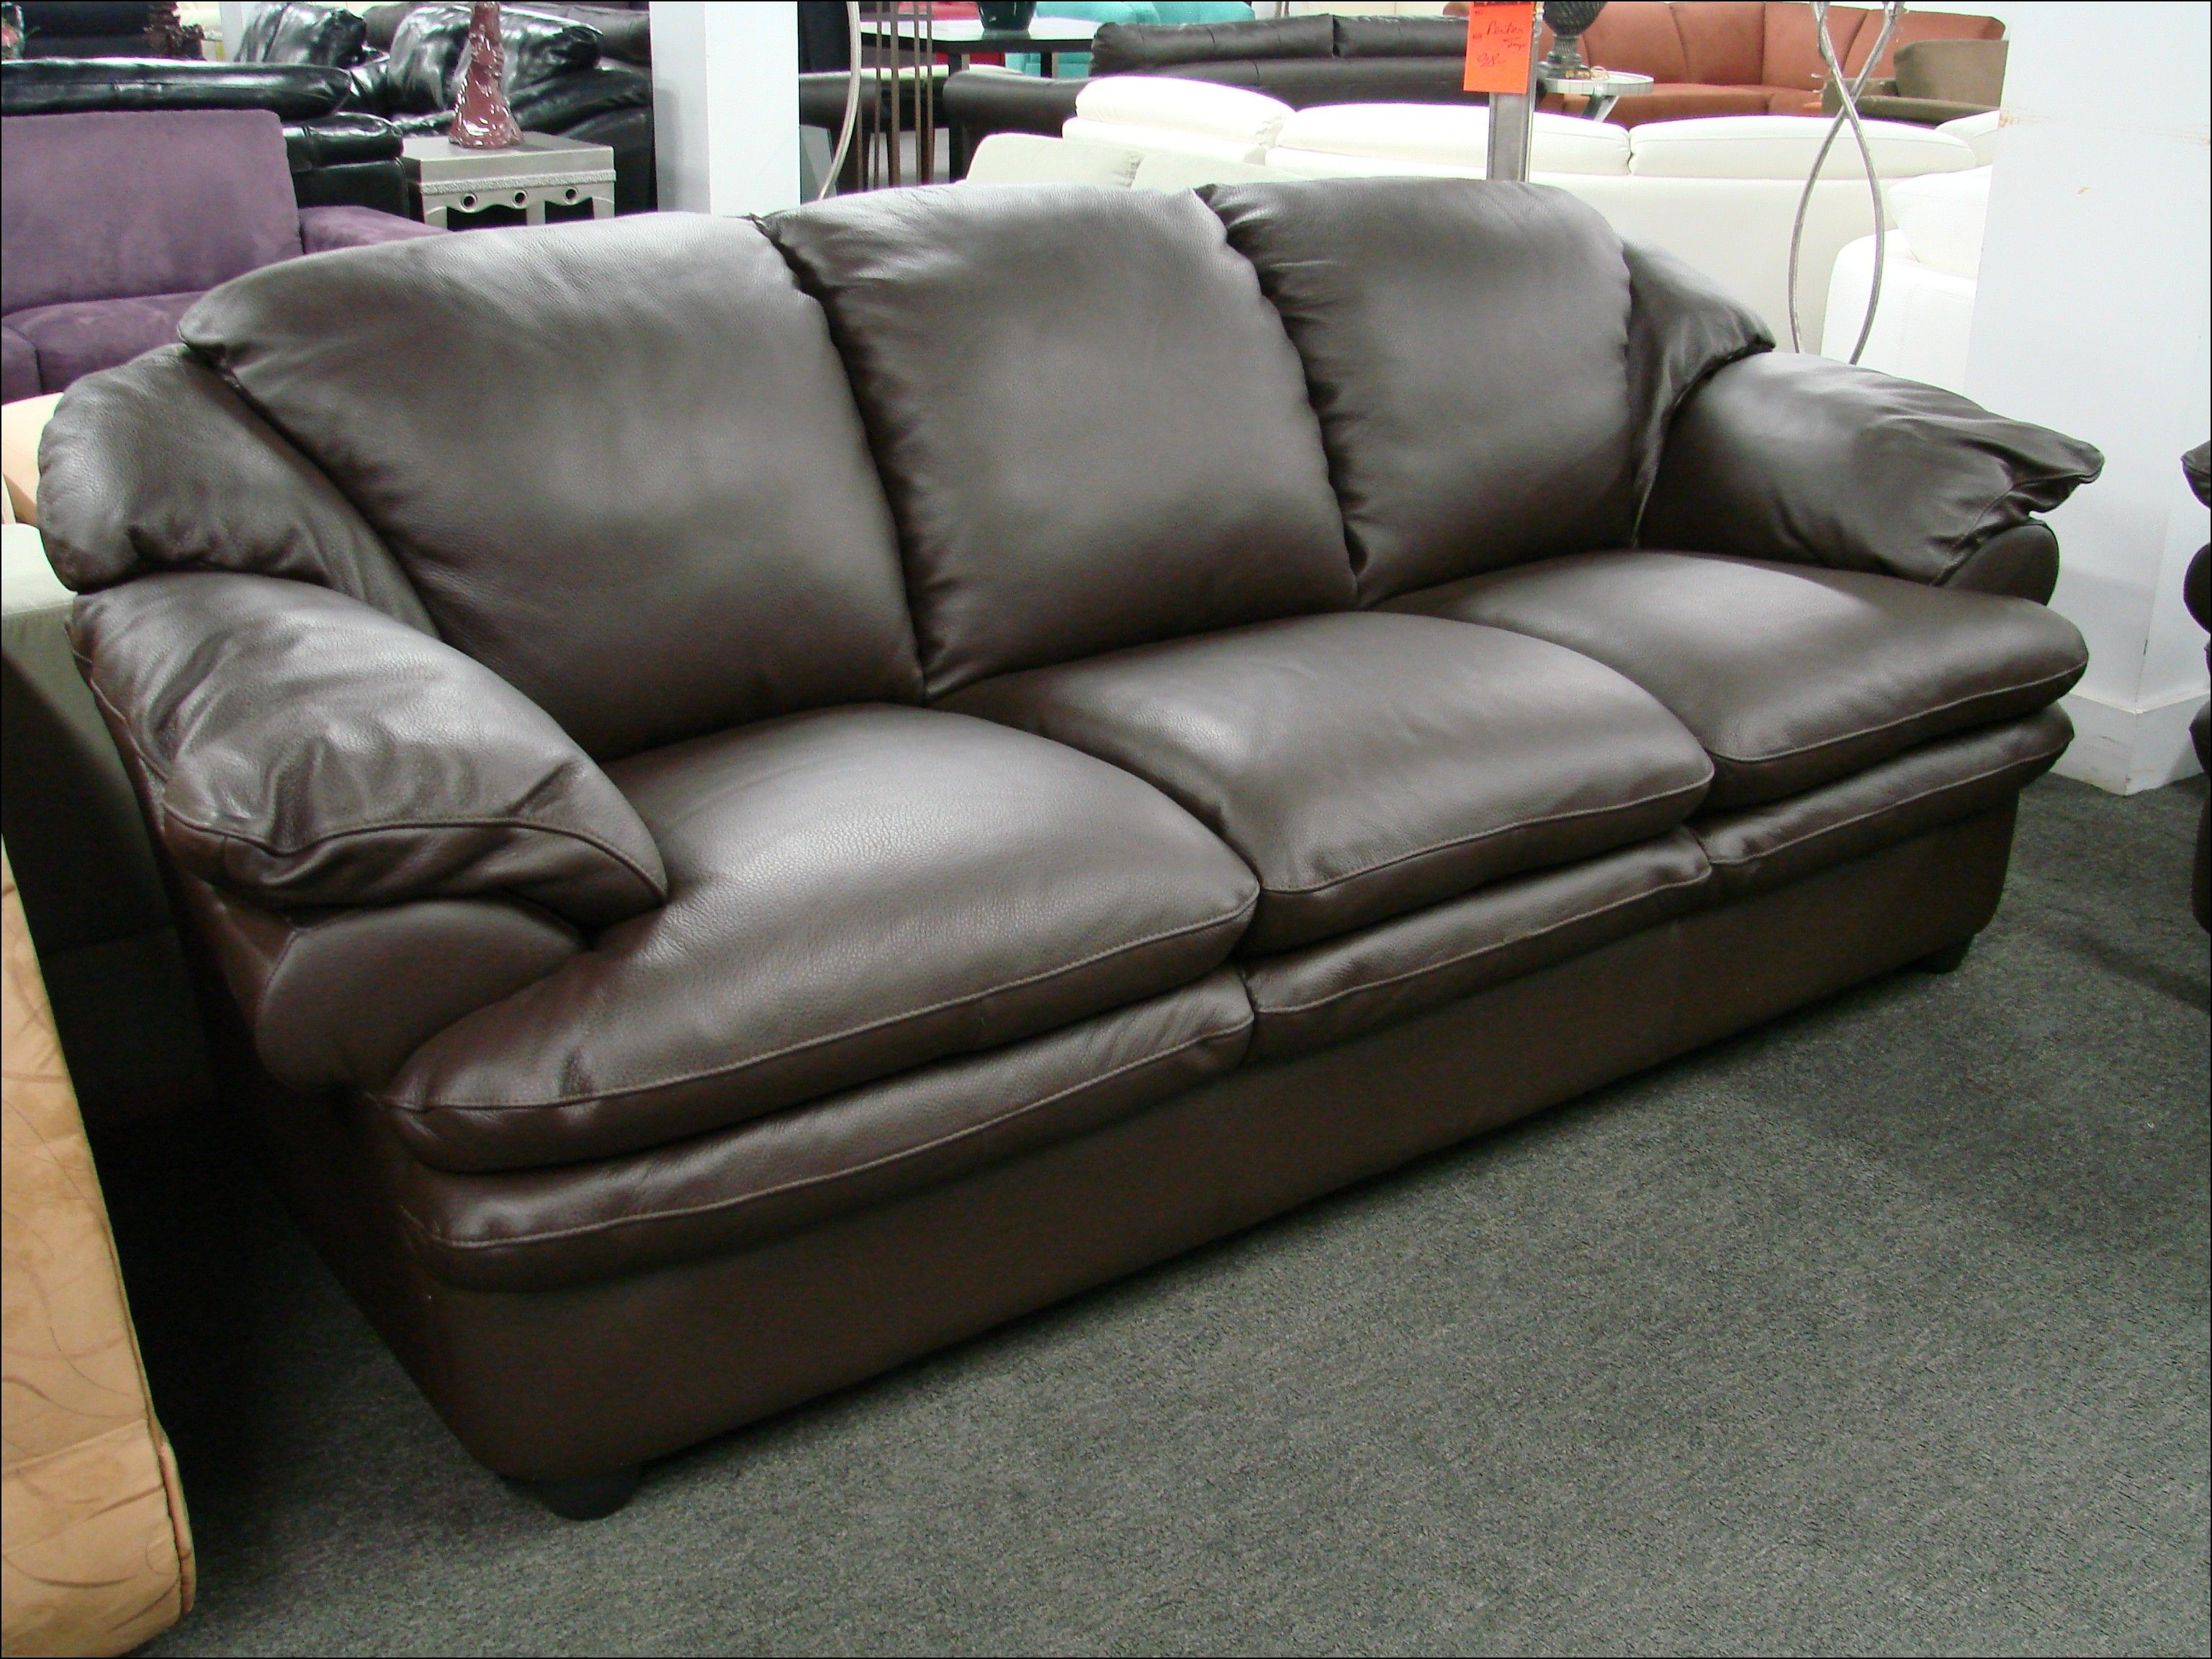 Charmant Natuzzi Leather Sofa Prices | Couch U0026 Sofa Gallery | Pinterest | Sofa  Price, Leather Sofas And Couch Sofa